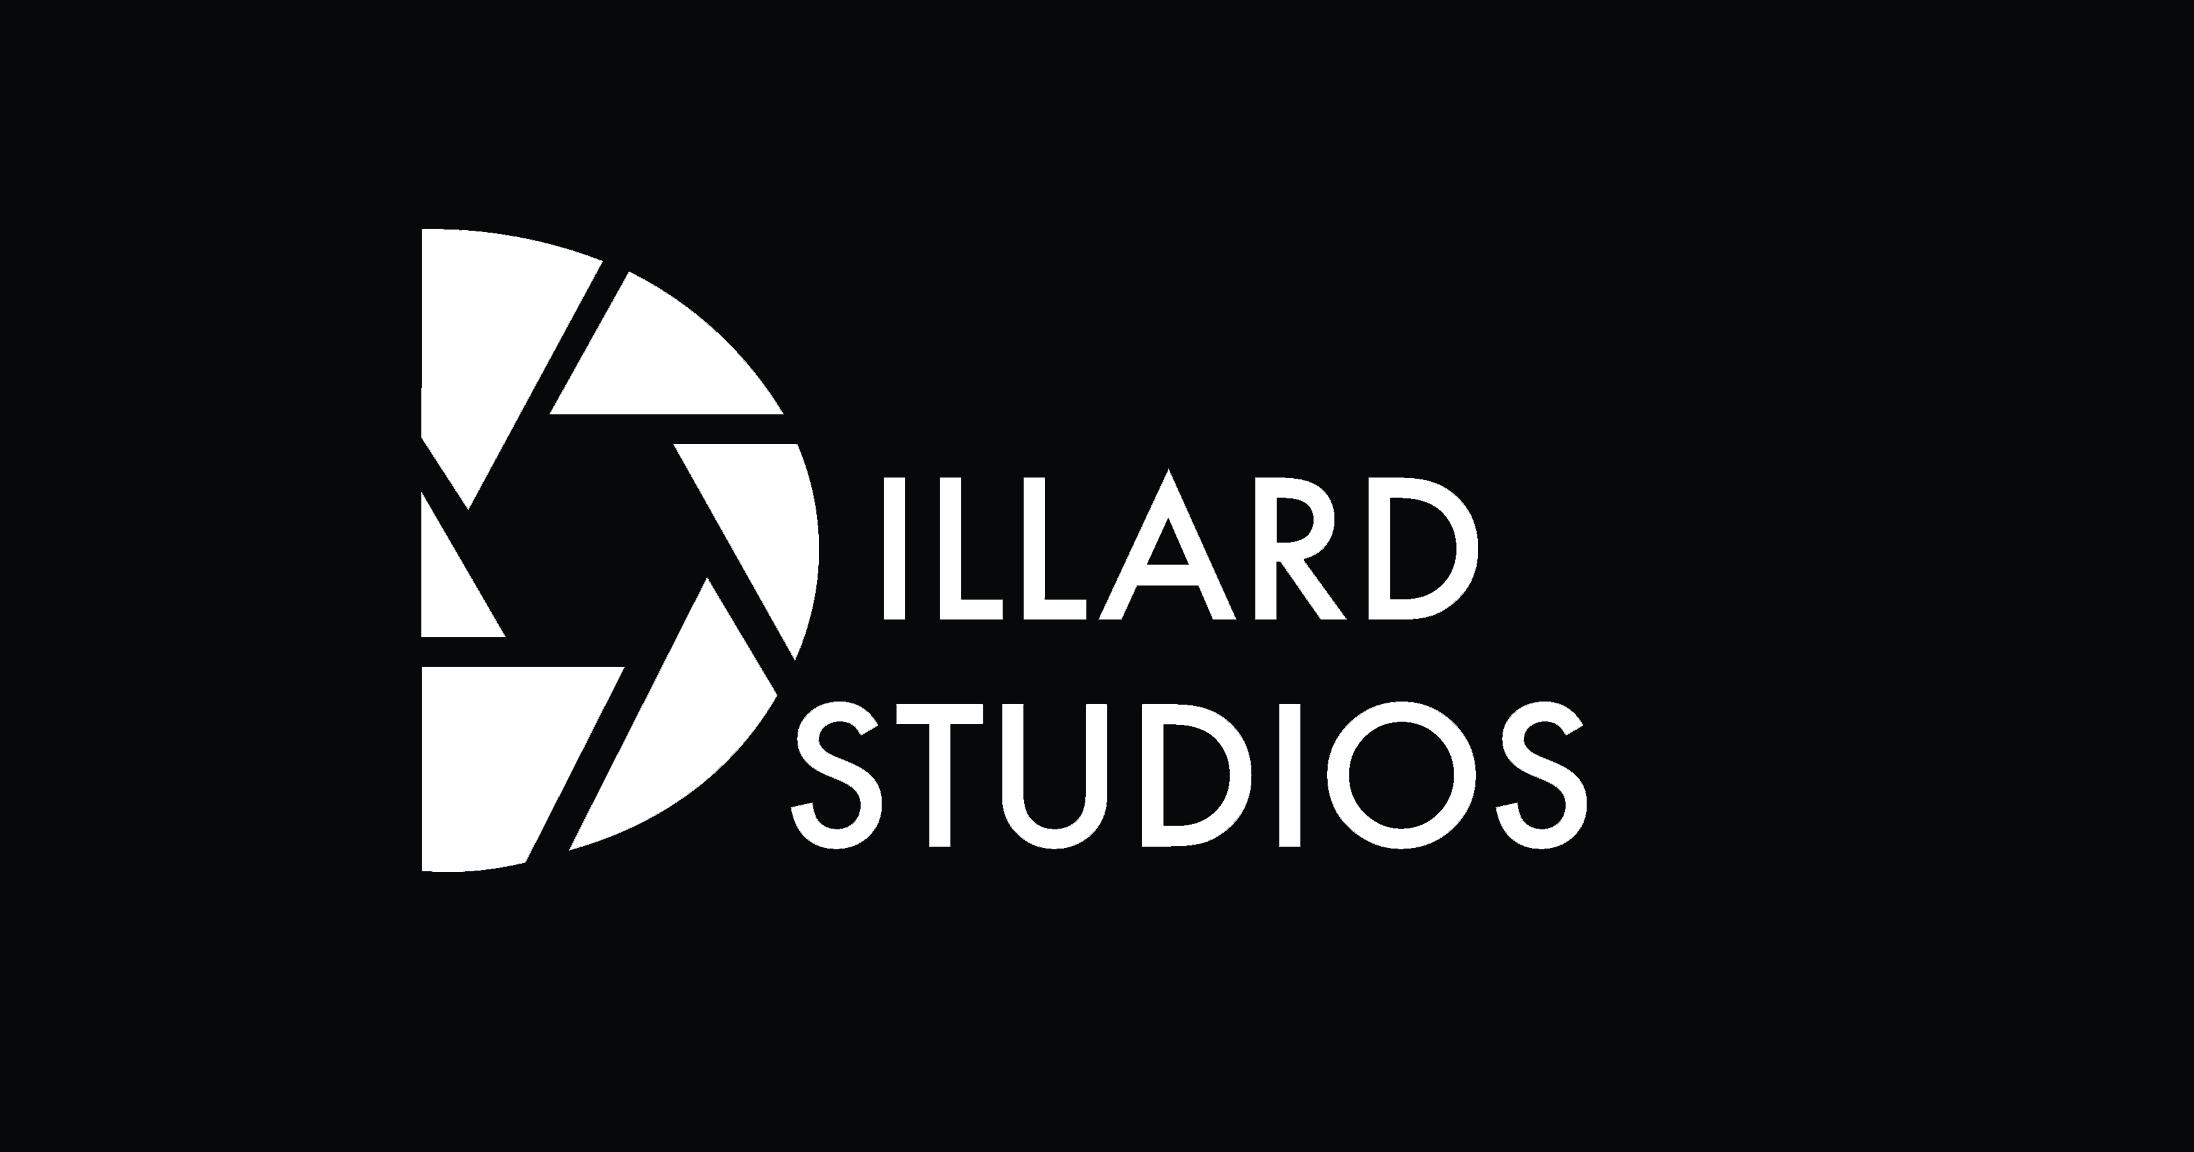 DillardStudios